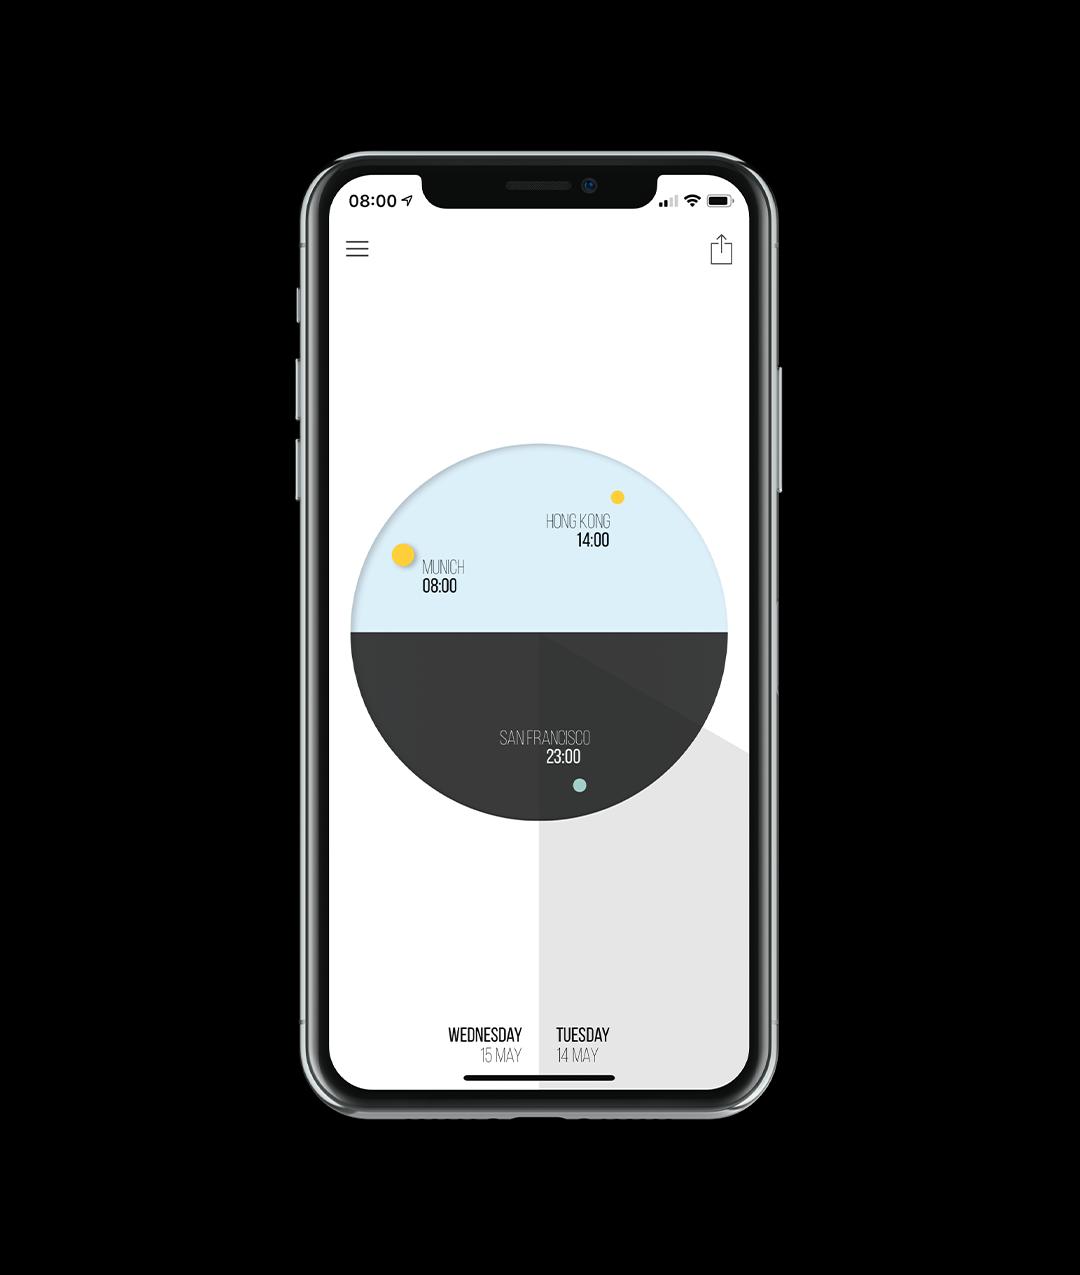 iPhoneX_Onetime_app